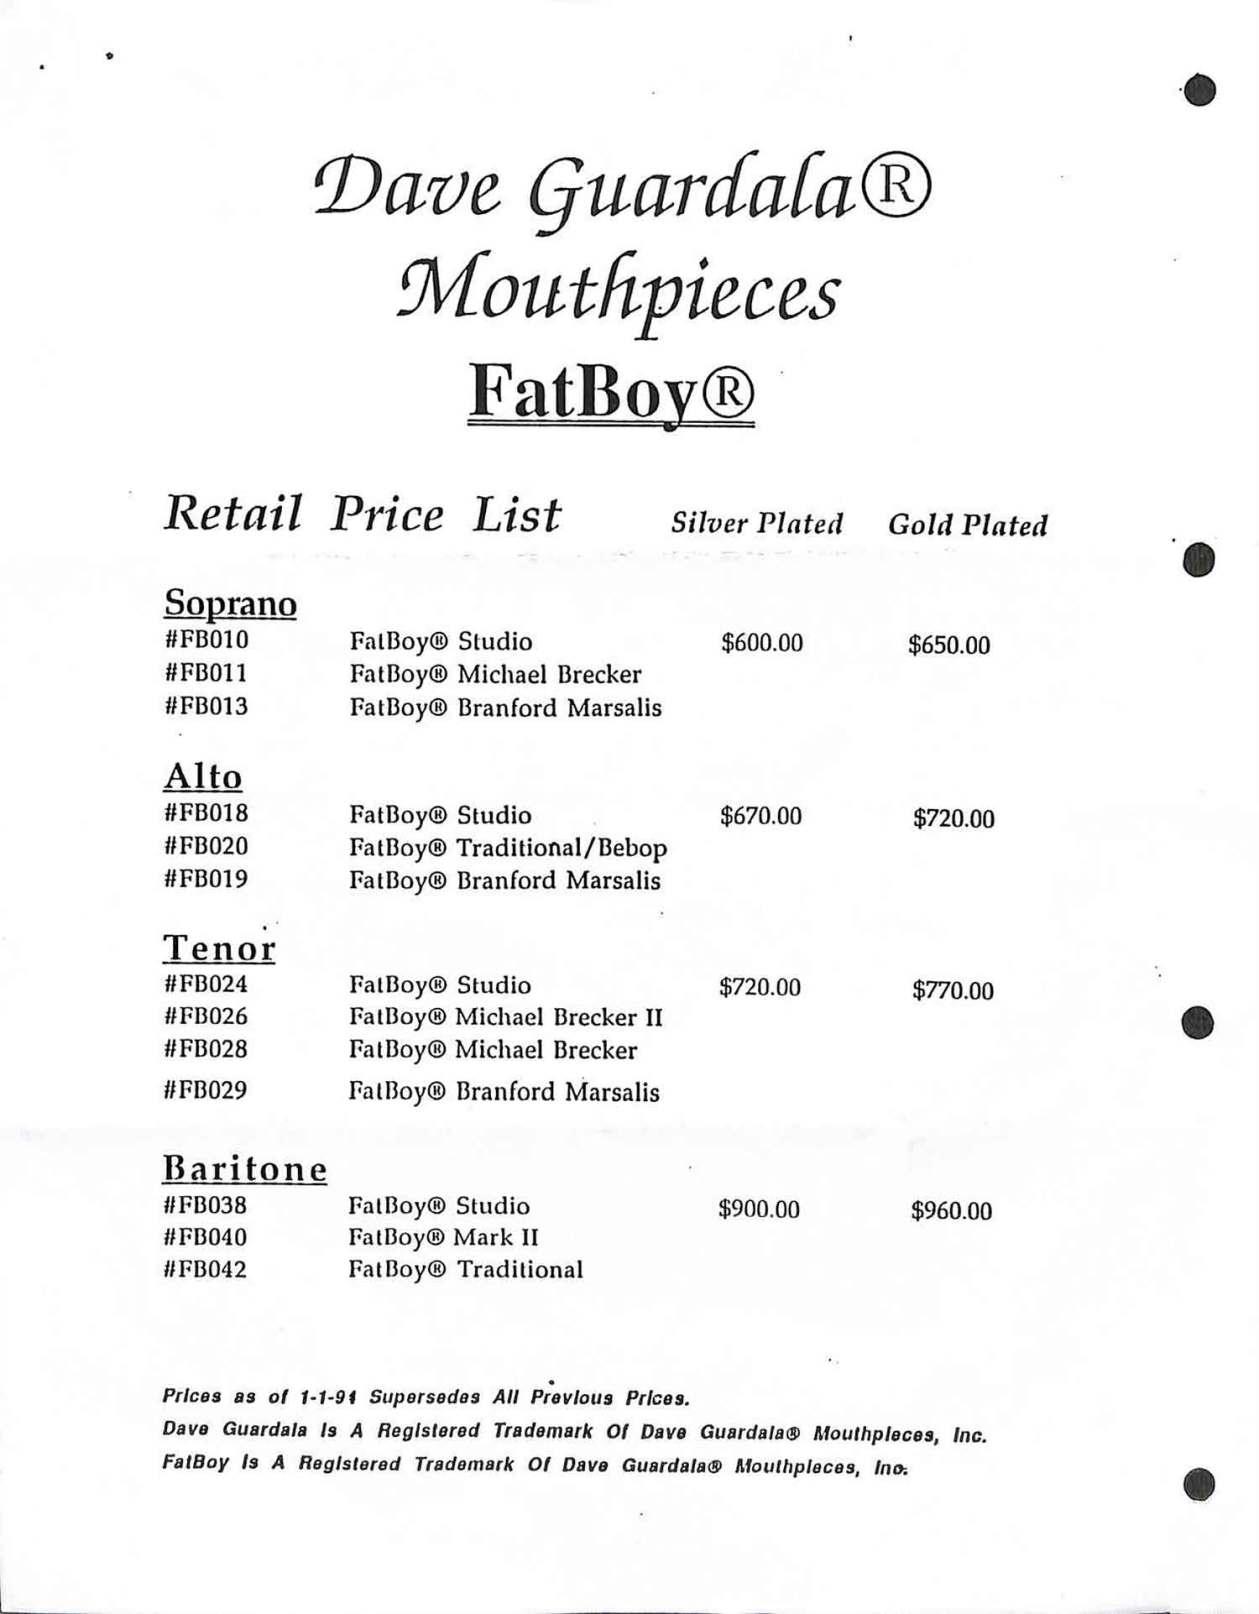 Dave Guardala, FatBoy, mouthpiece, brochure, price list, saxophone